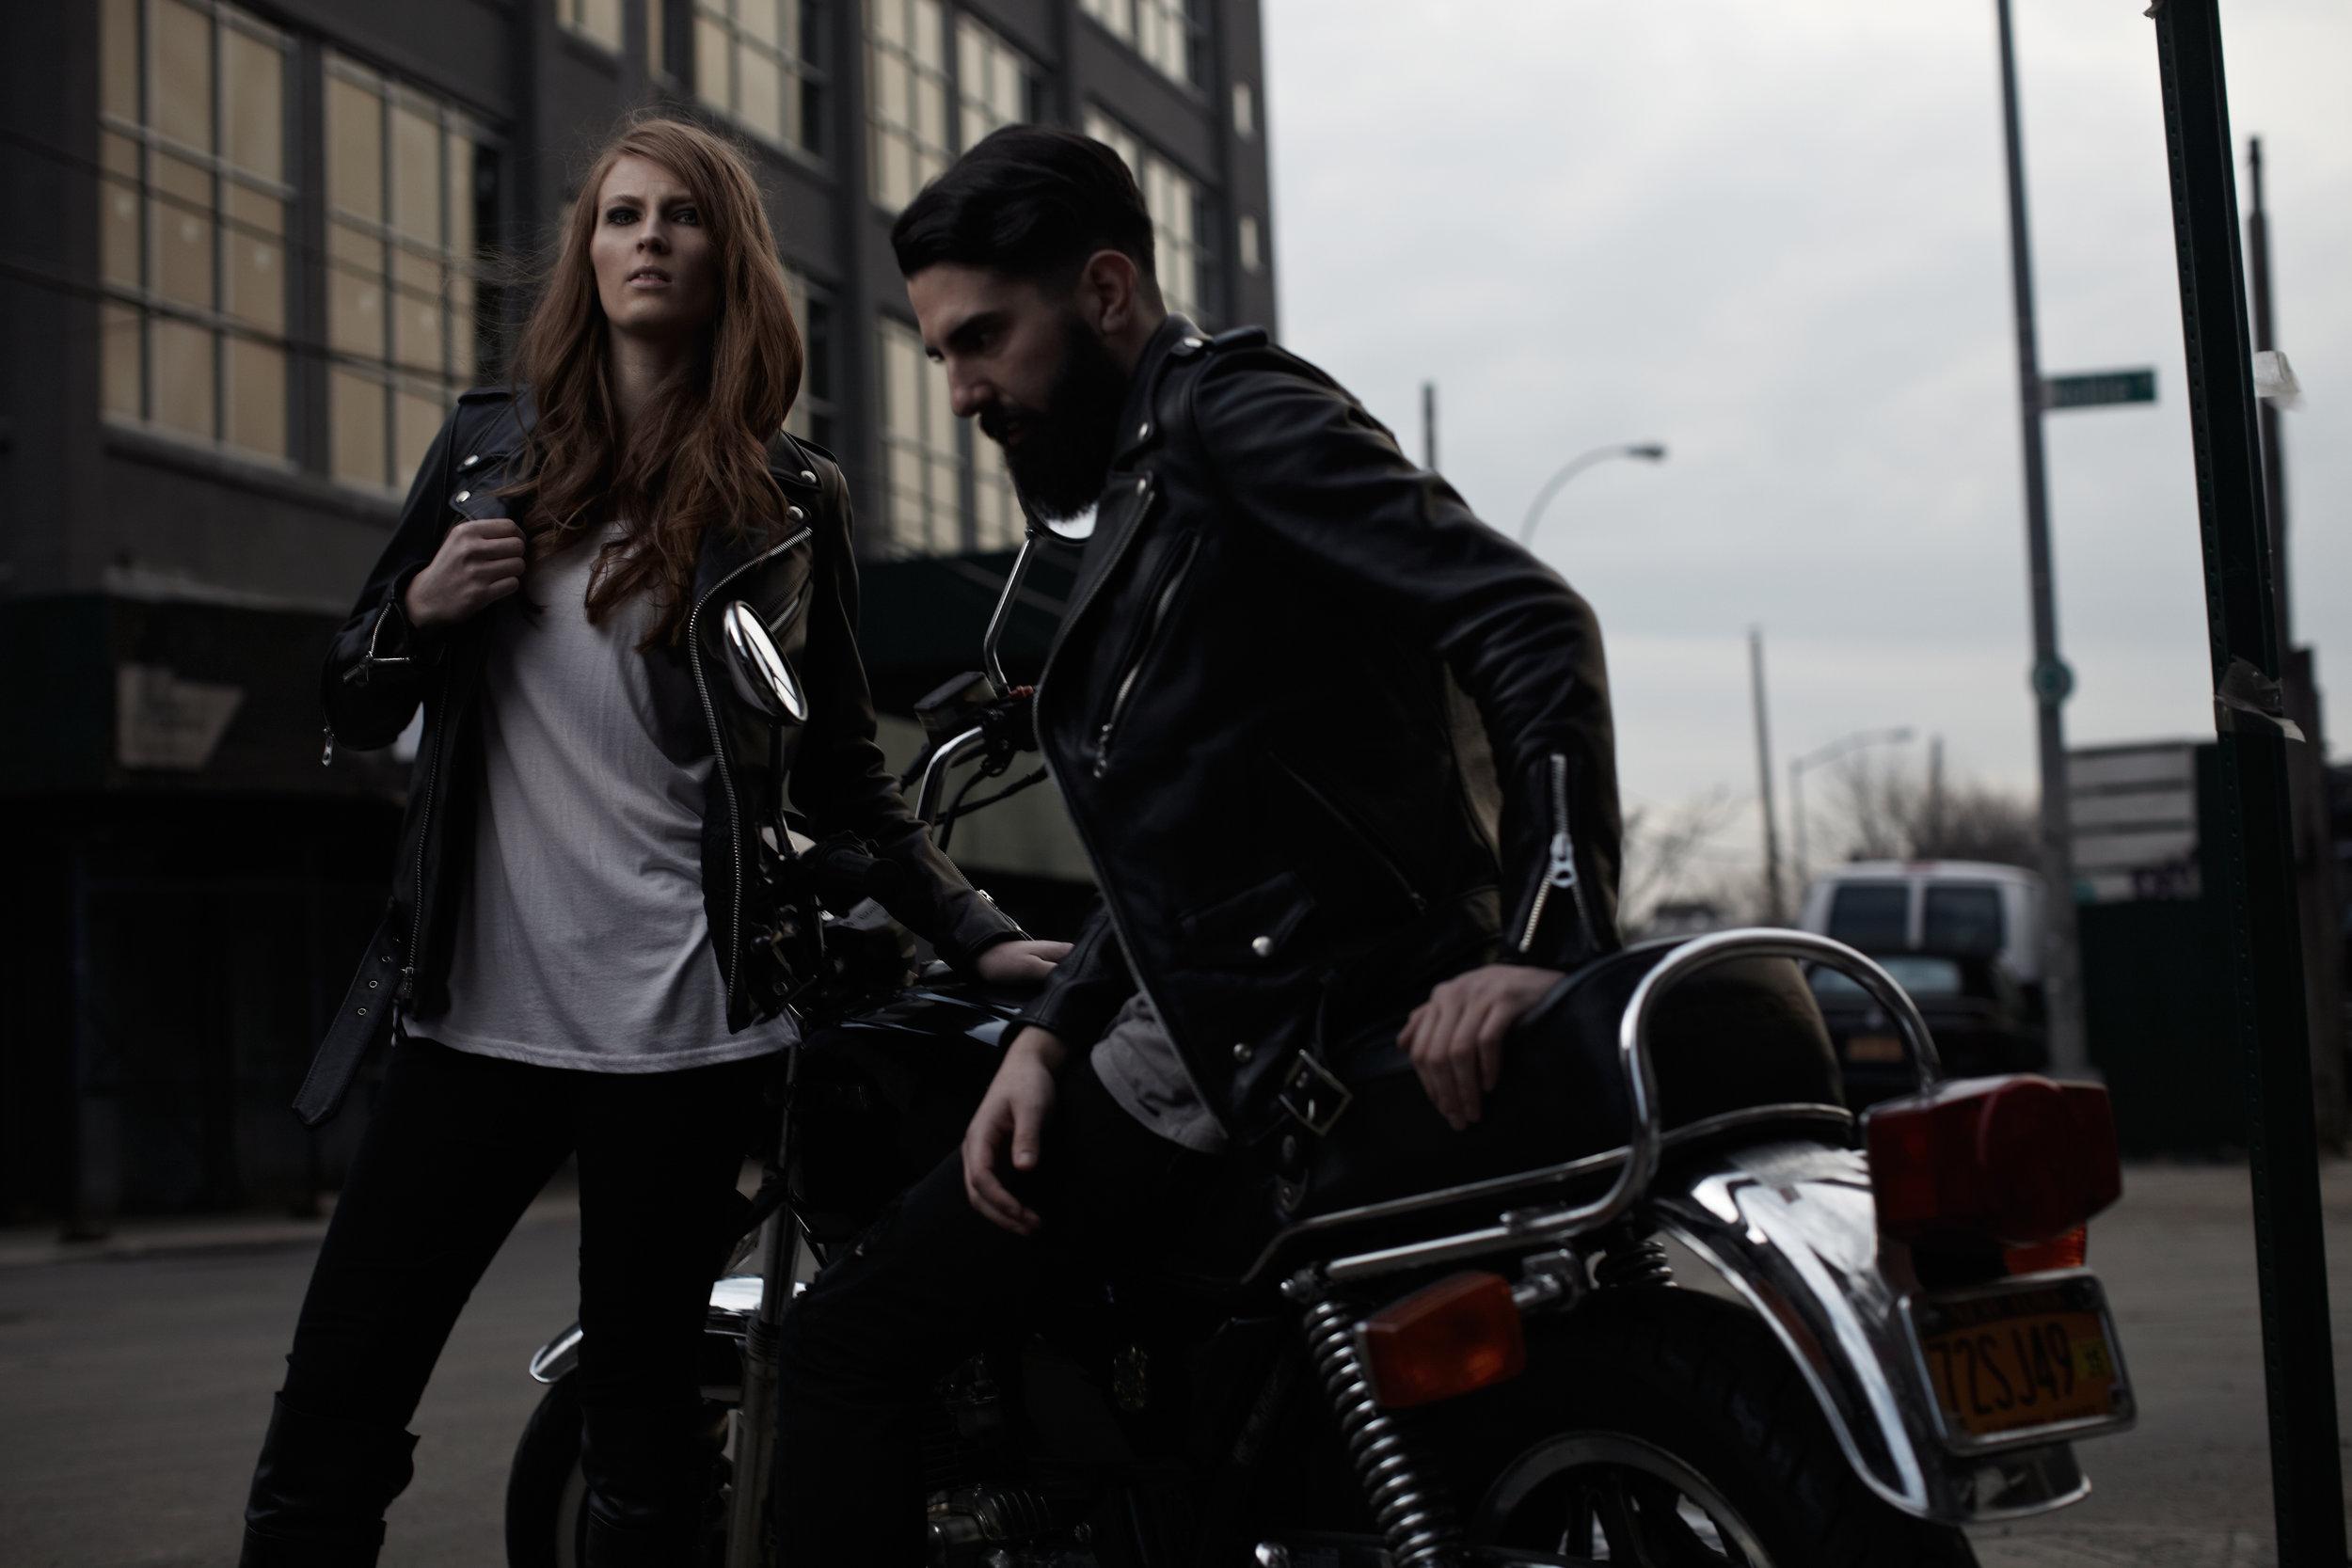 Editorial_Outside_Motorcycle1.jpg